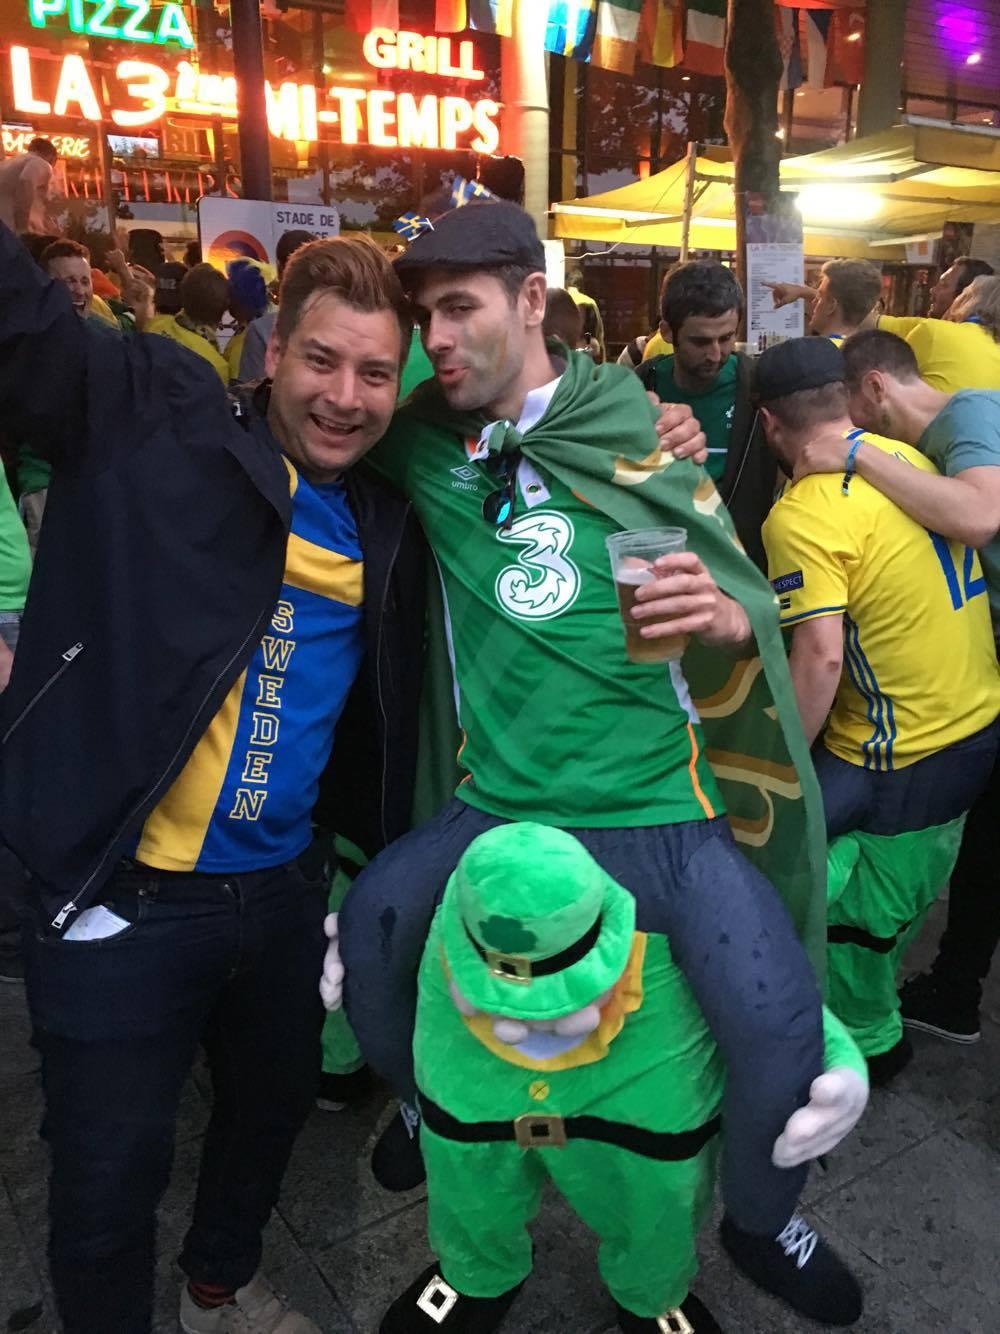 SWE - IRA fans